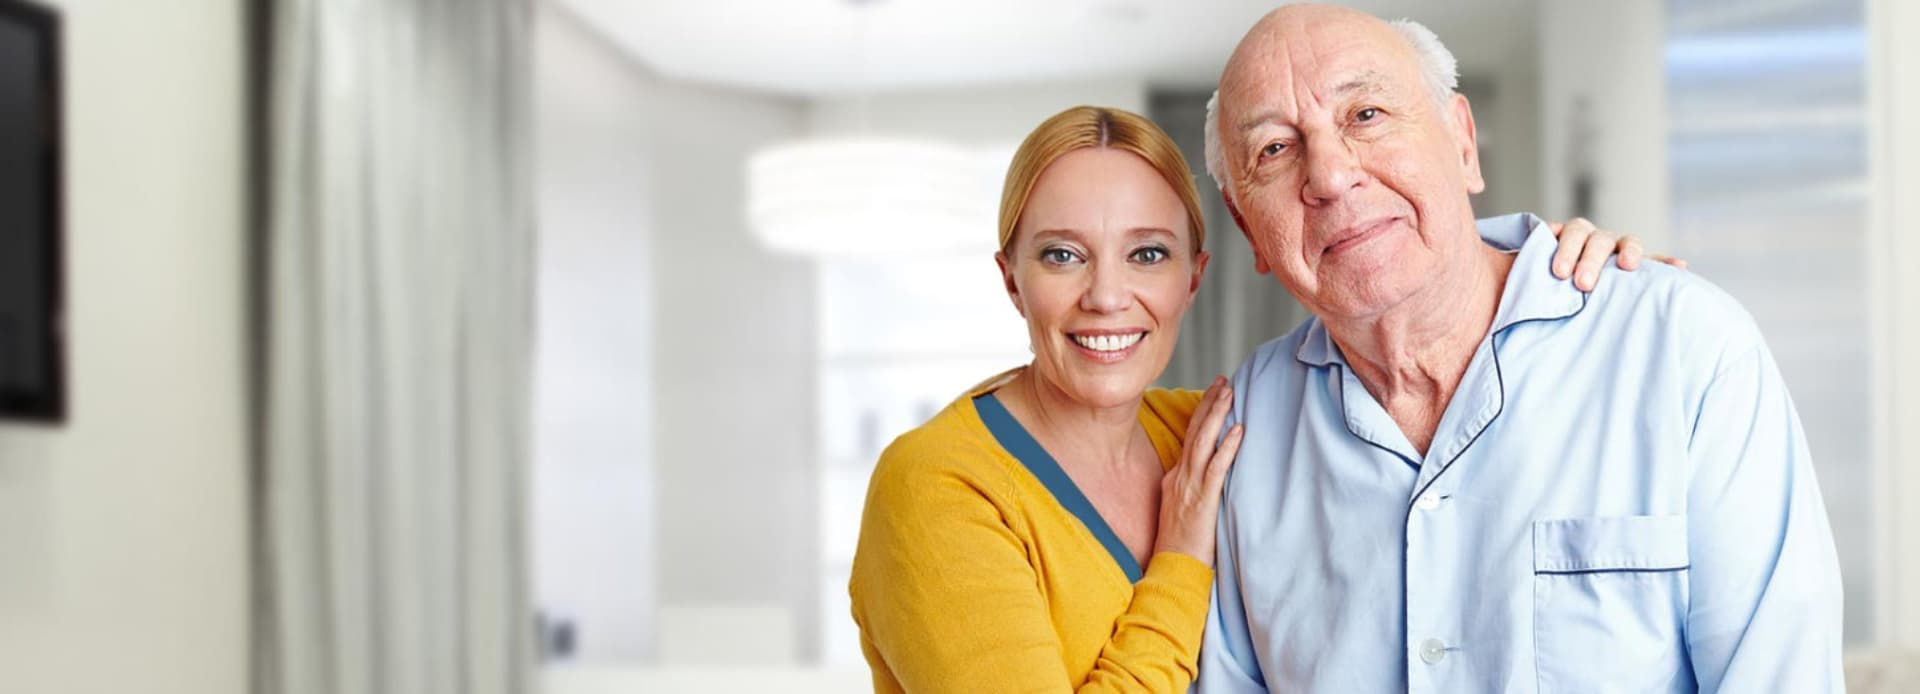 caregiver and senior man standing